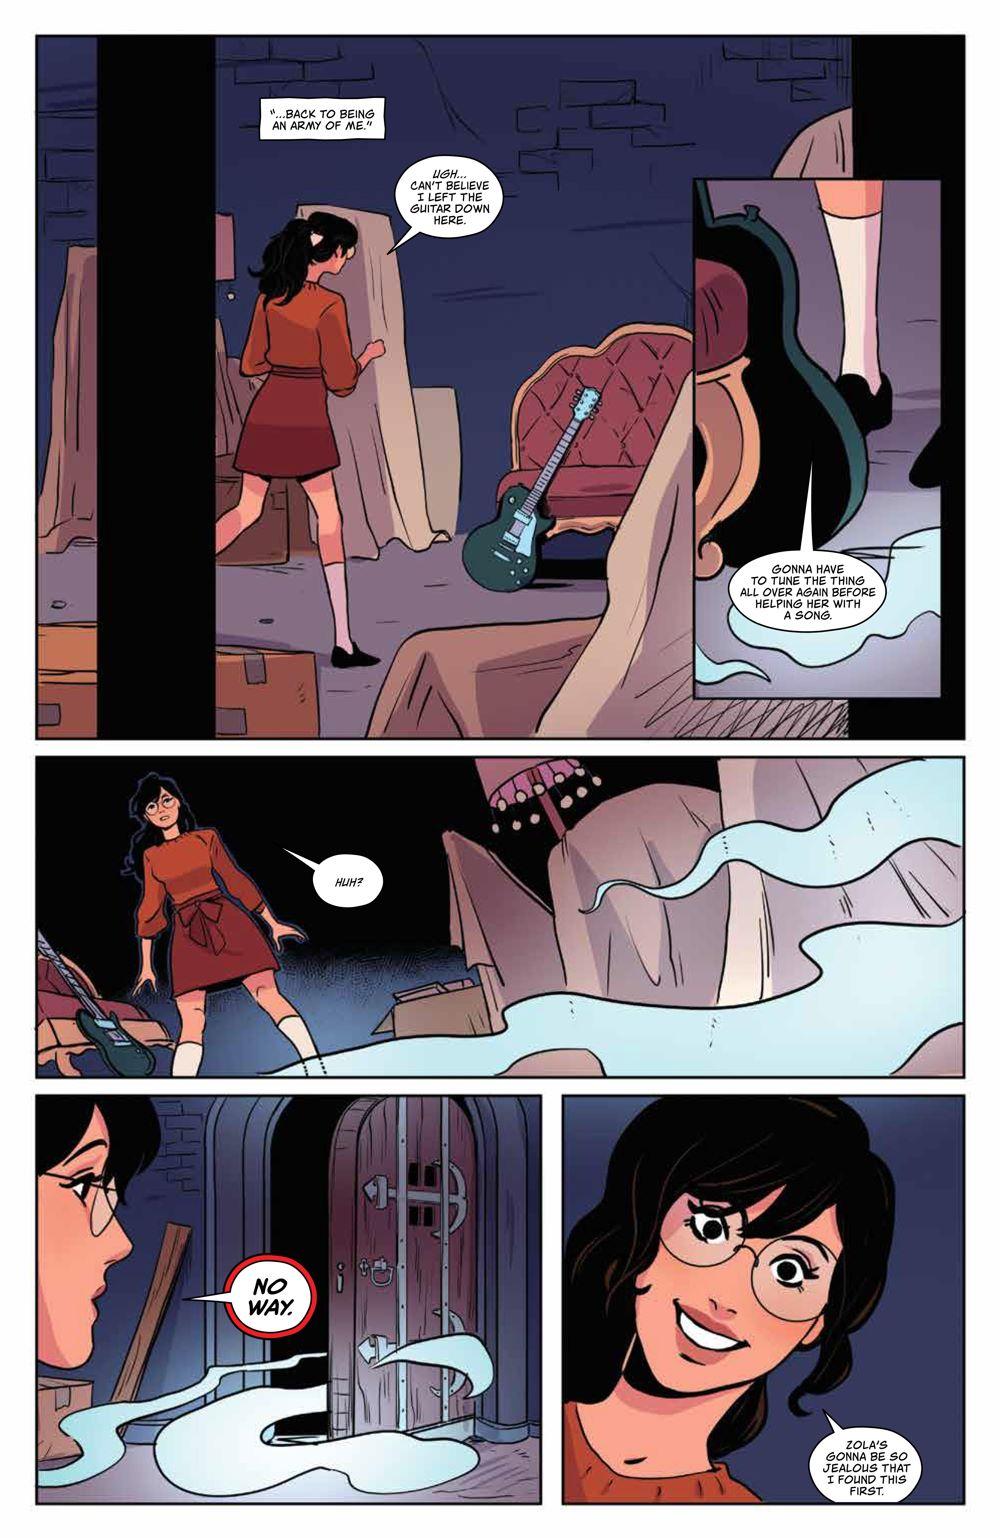 GhostedInLA_v3_SC_PRESS_18 ComicList Previews: GHOSTED IN L.A. VOLUME 3 TP